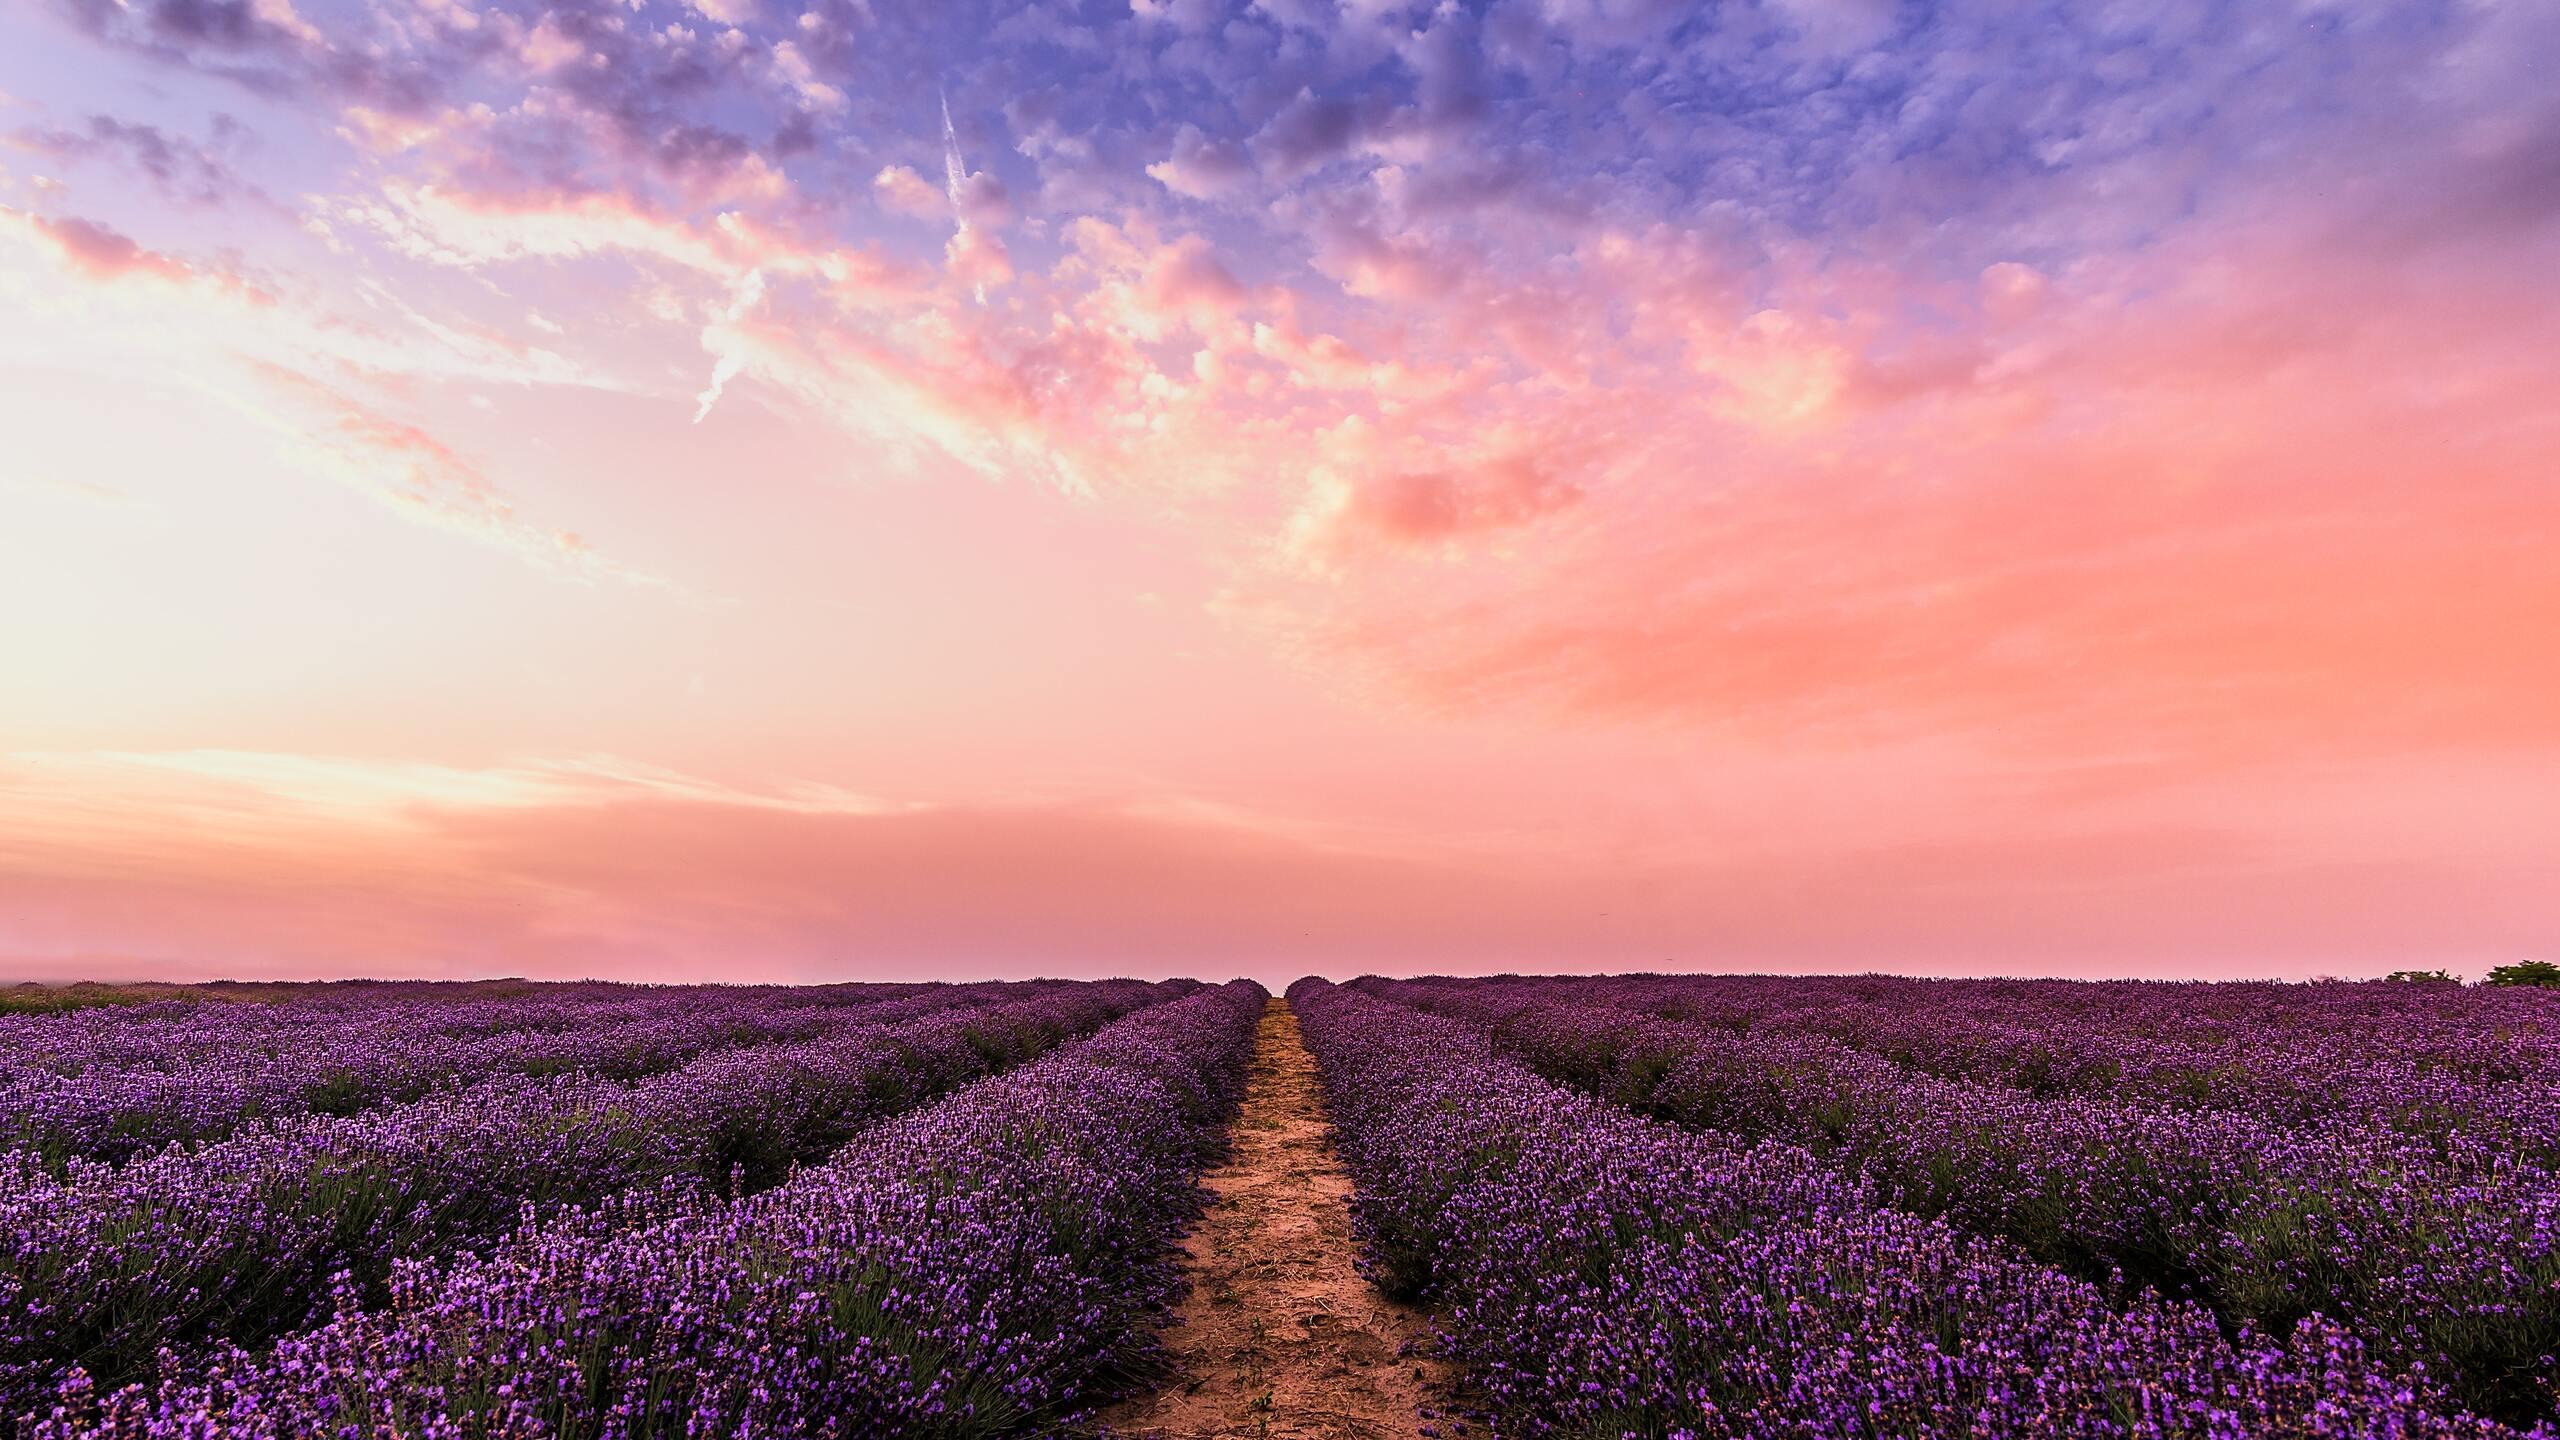 lavender-field-under-pink-sky-5k-ef.jpg